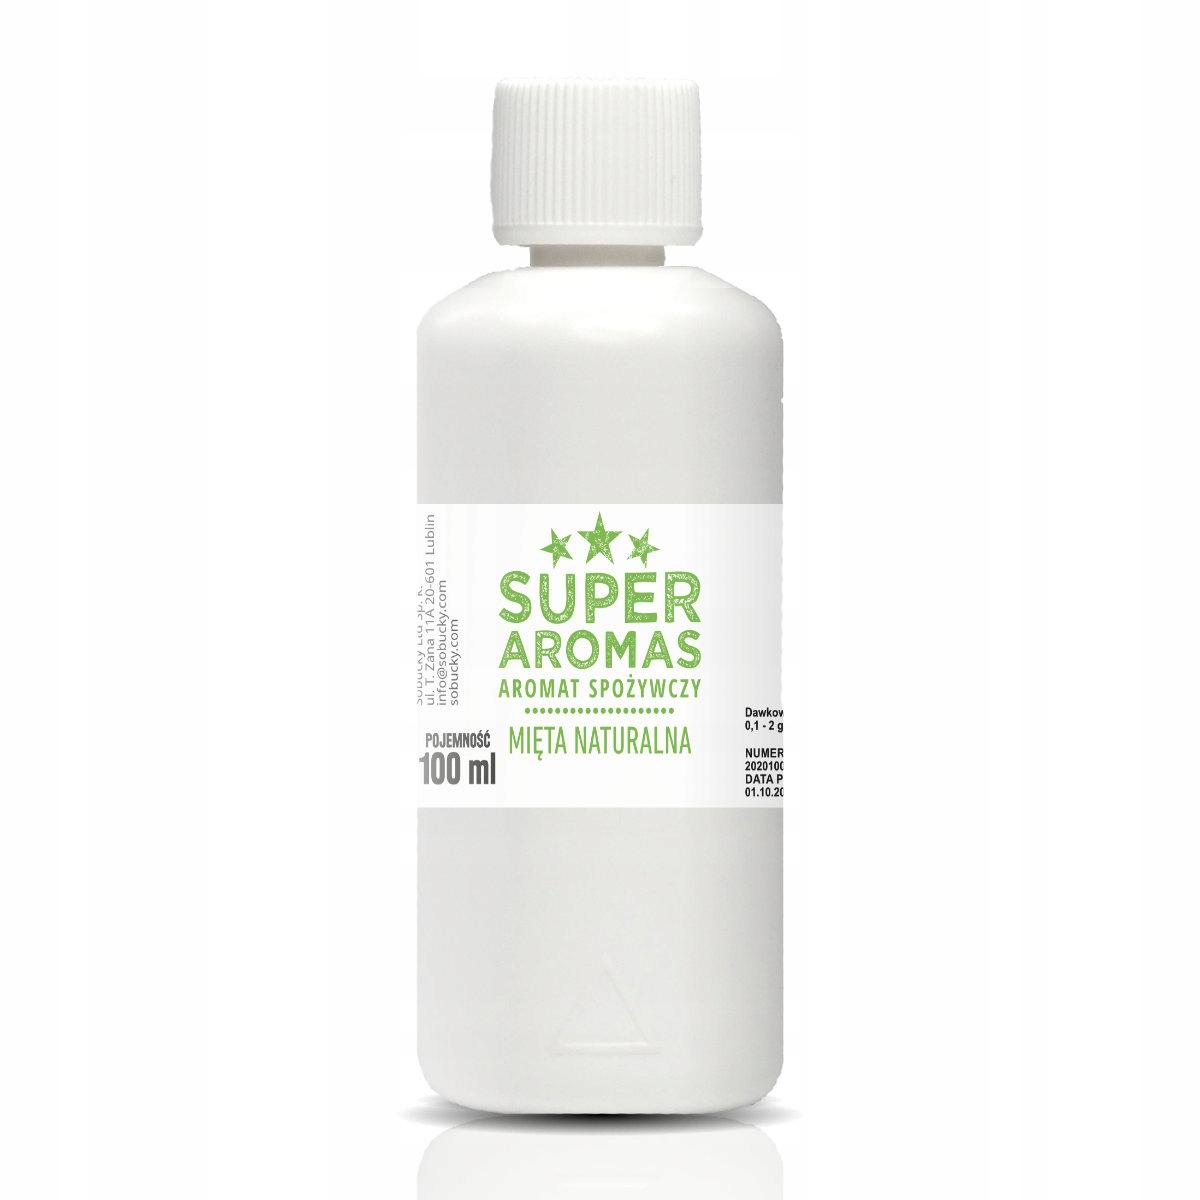 SUPER AROMAS Aromat spożywczy MIĘTA NATURALNA 100